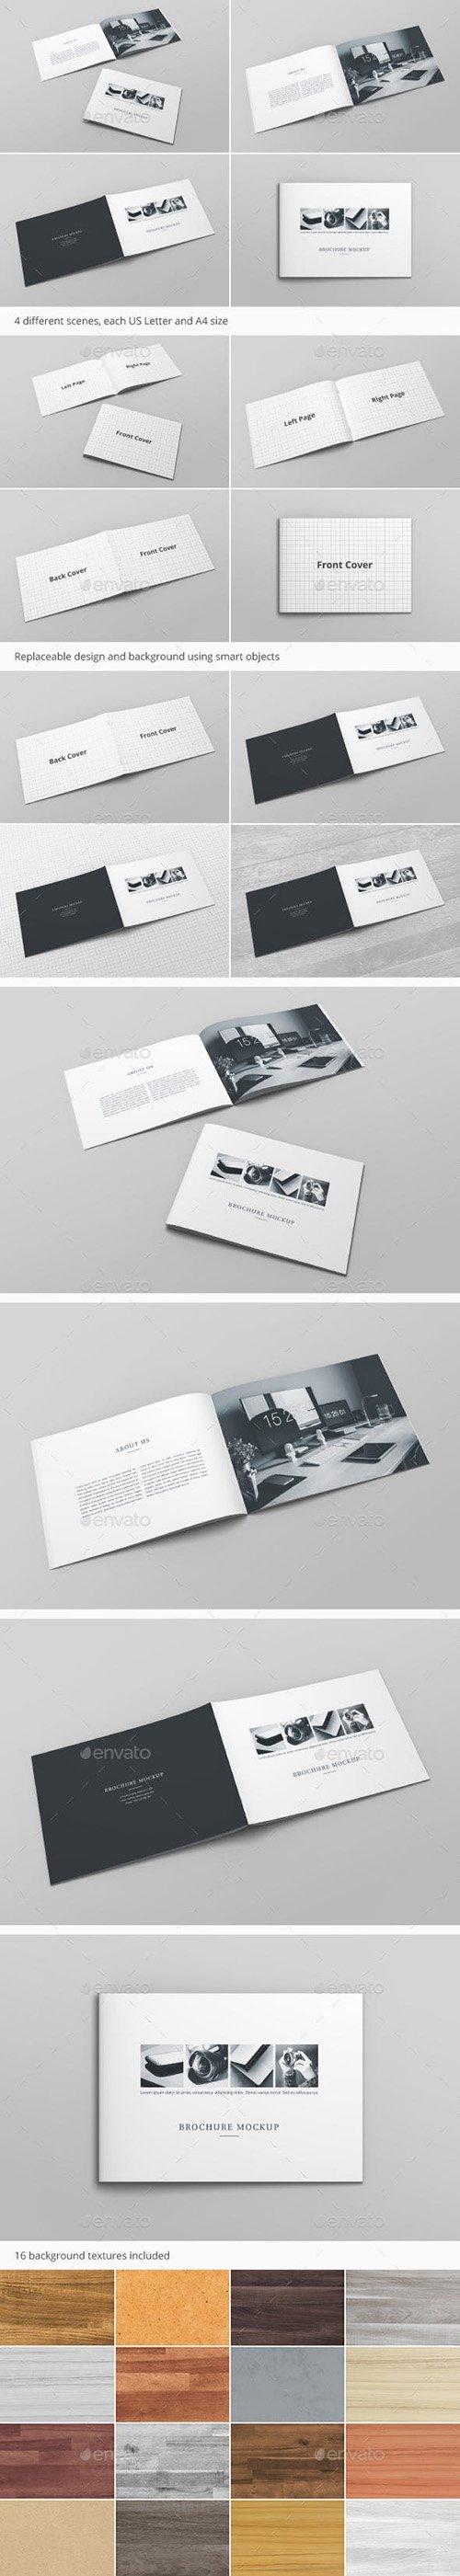 GR - Brochure Catalog Mockup Vol. 2 21420515